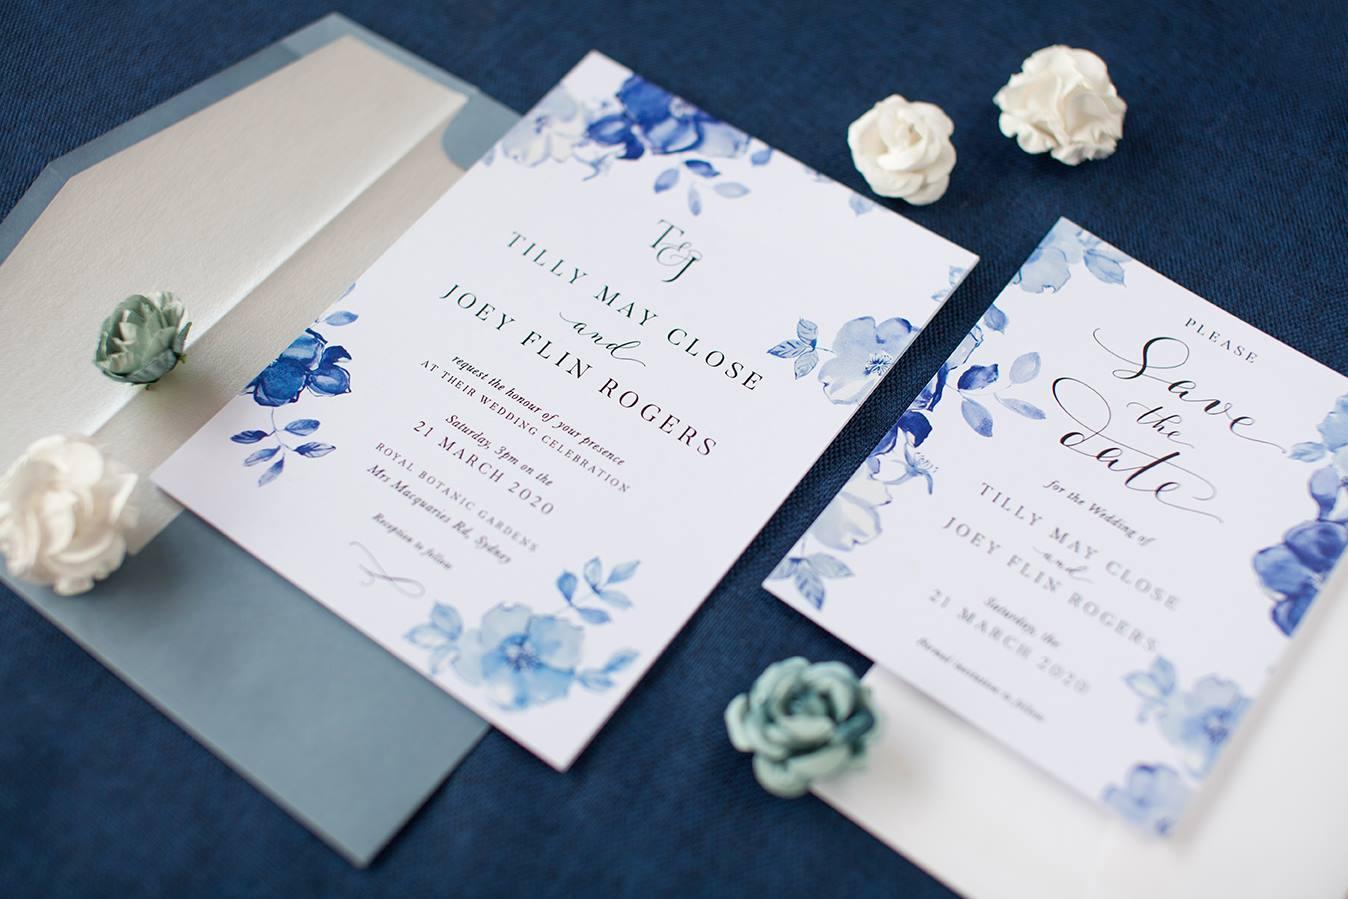 Paperlust elegant wedding invitations